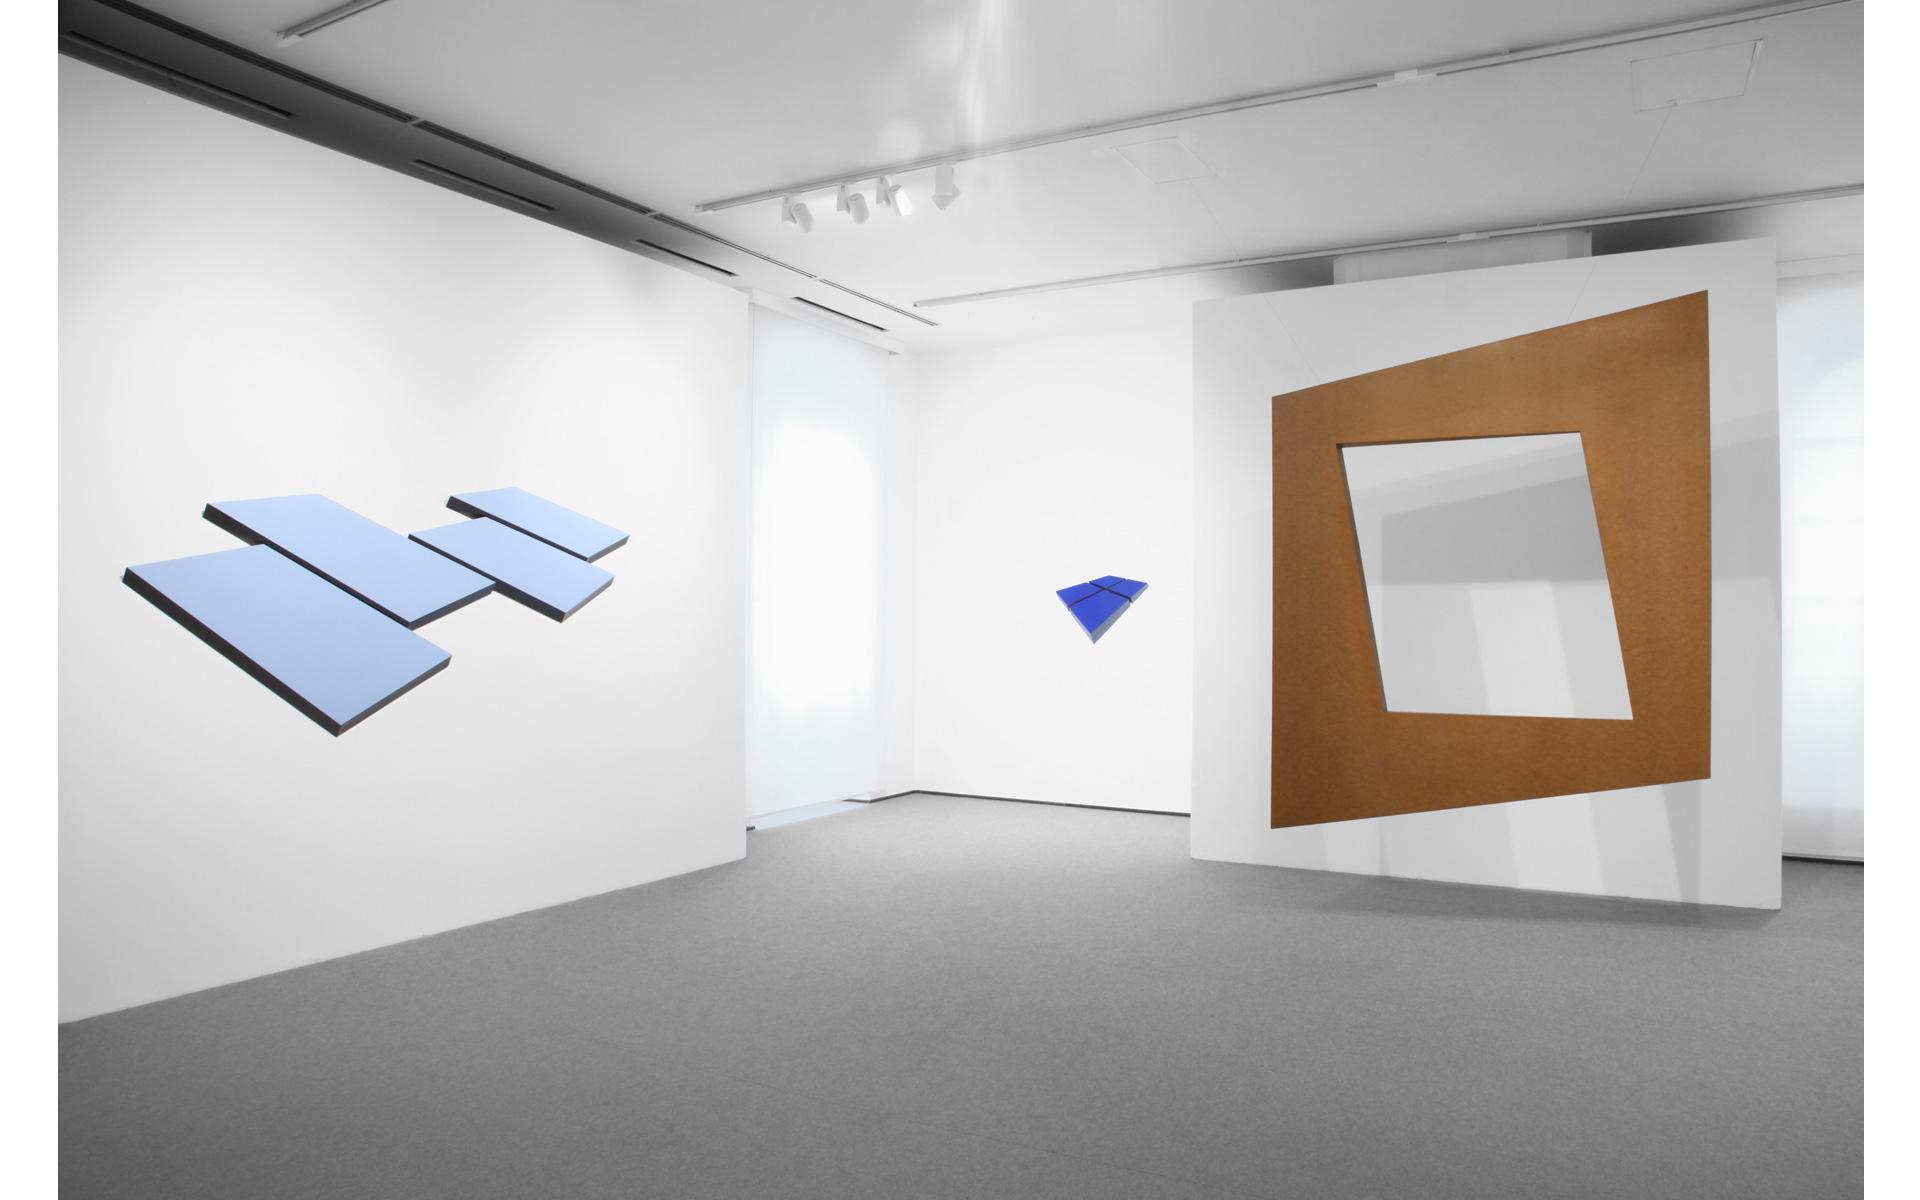 Installation view Museo Marca, Catanzaro, 2018 - Photo: Bruno Bani